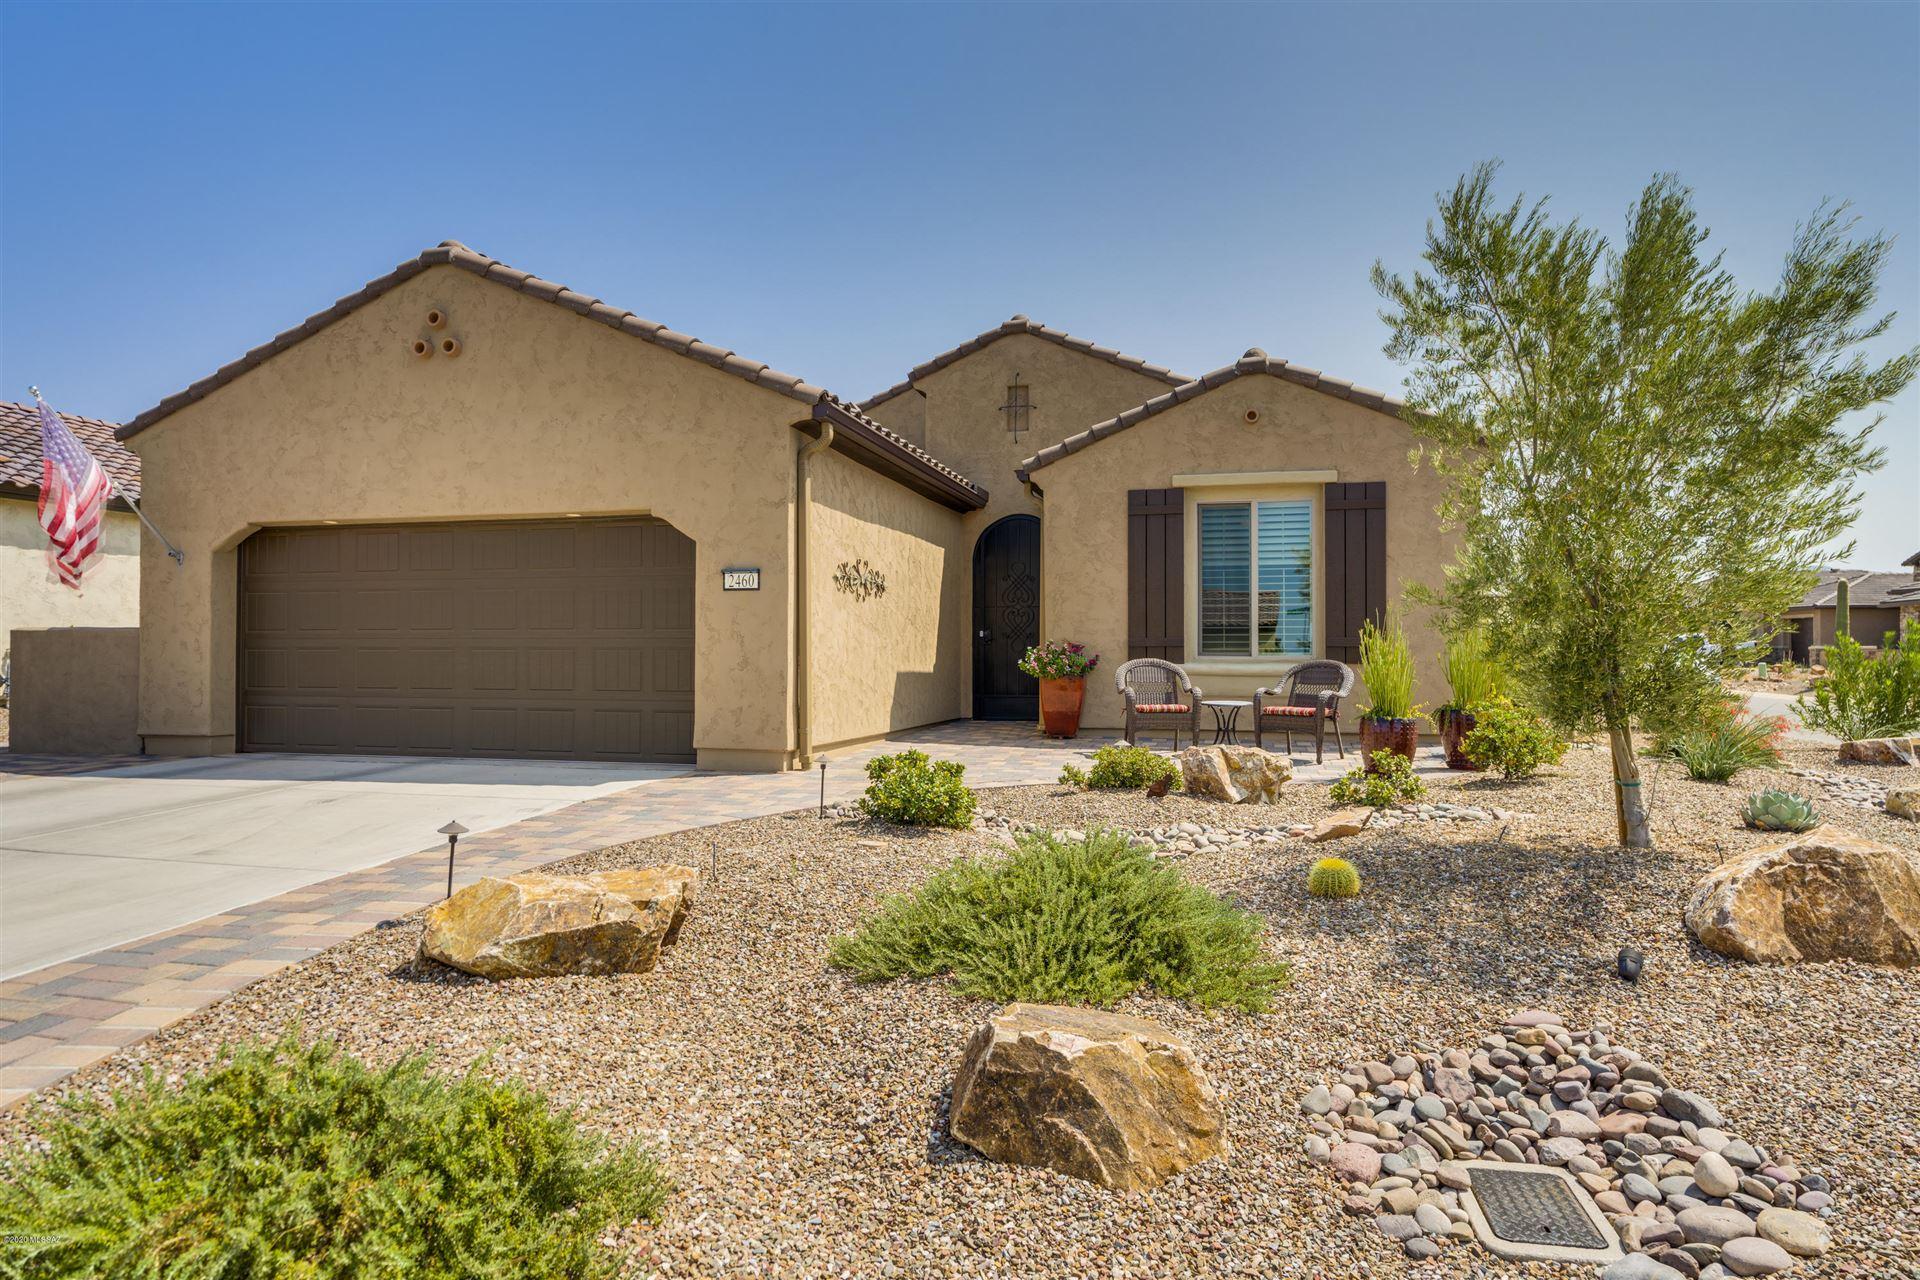 2460 E Rolling Meadow Lane, Green Valley, AZ 85614 - #: 22023488